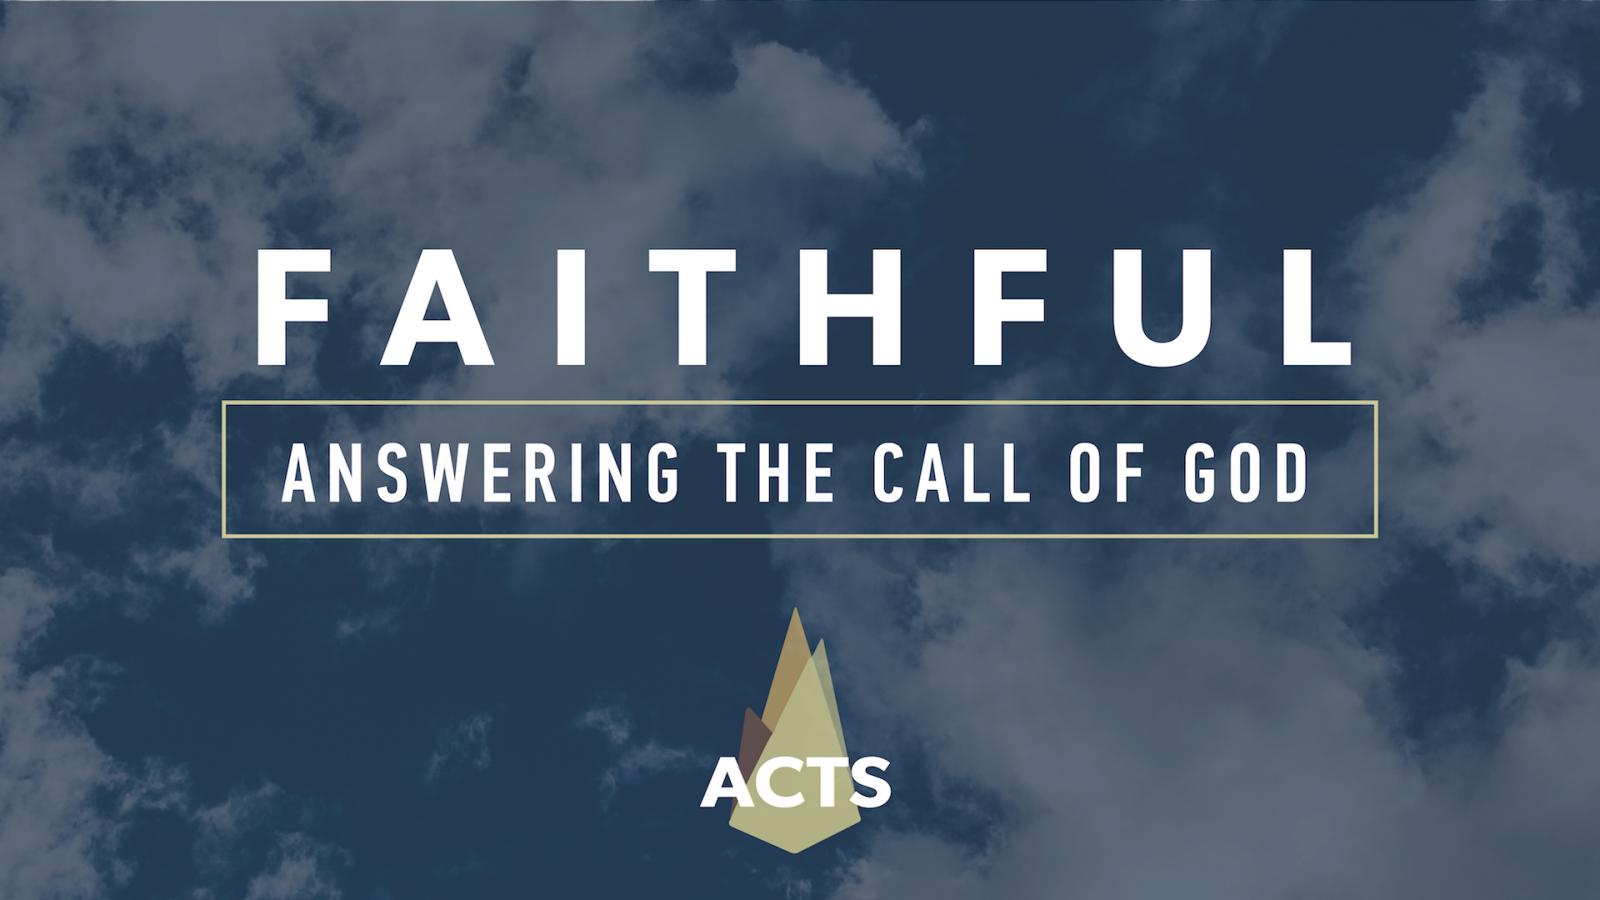 Faithful: Answering the Call of God